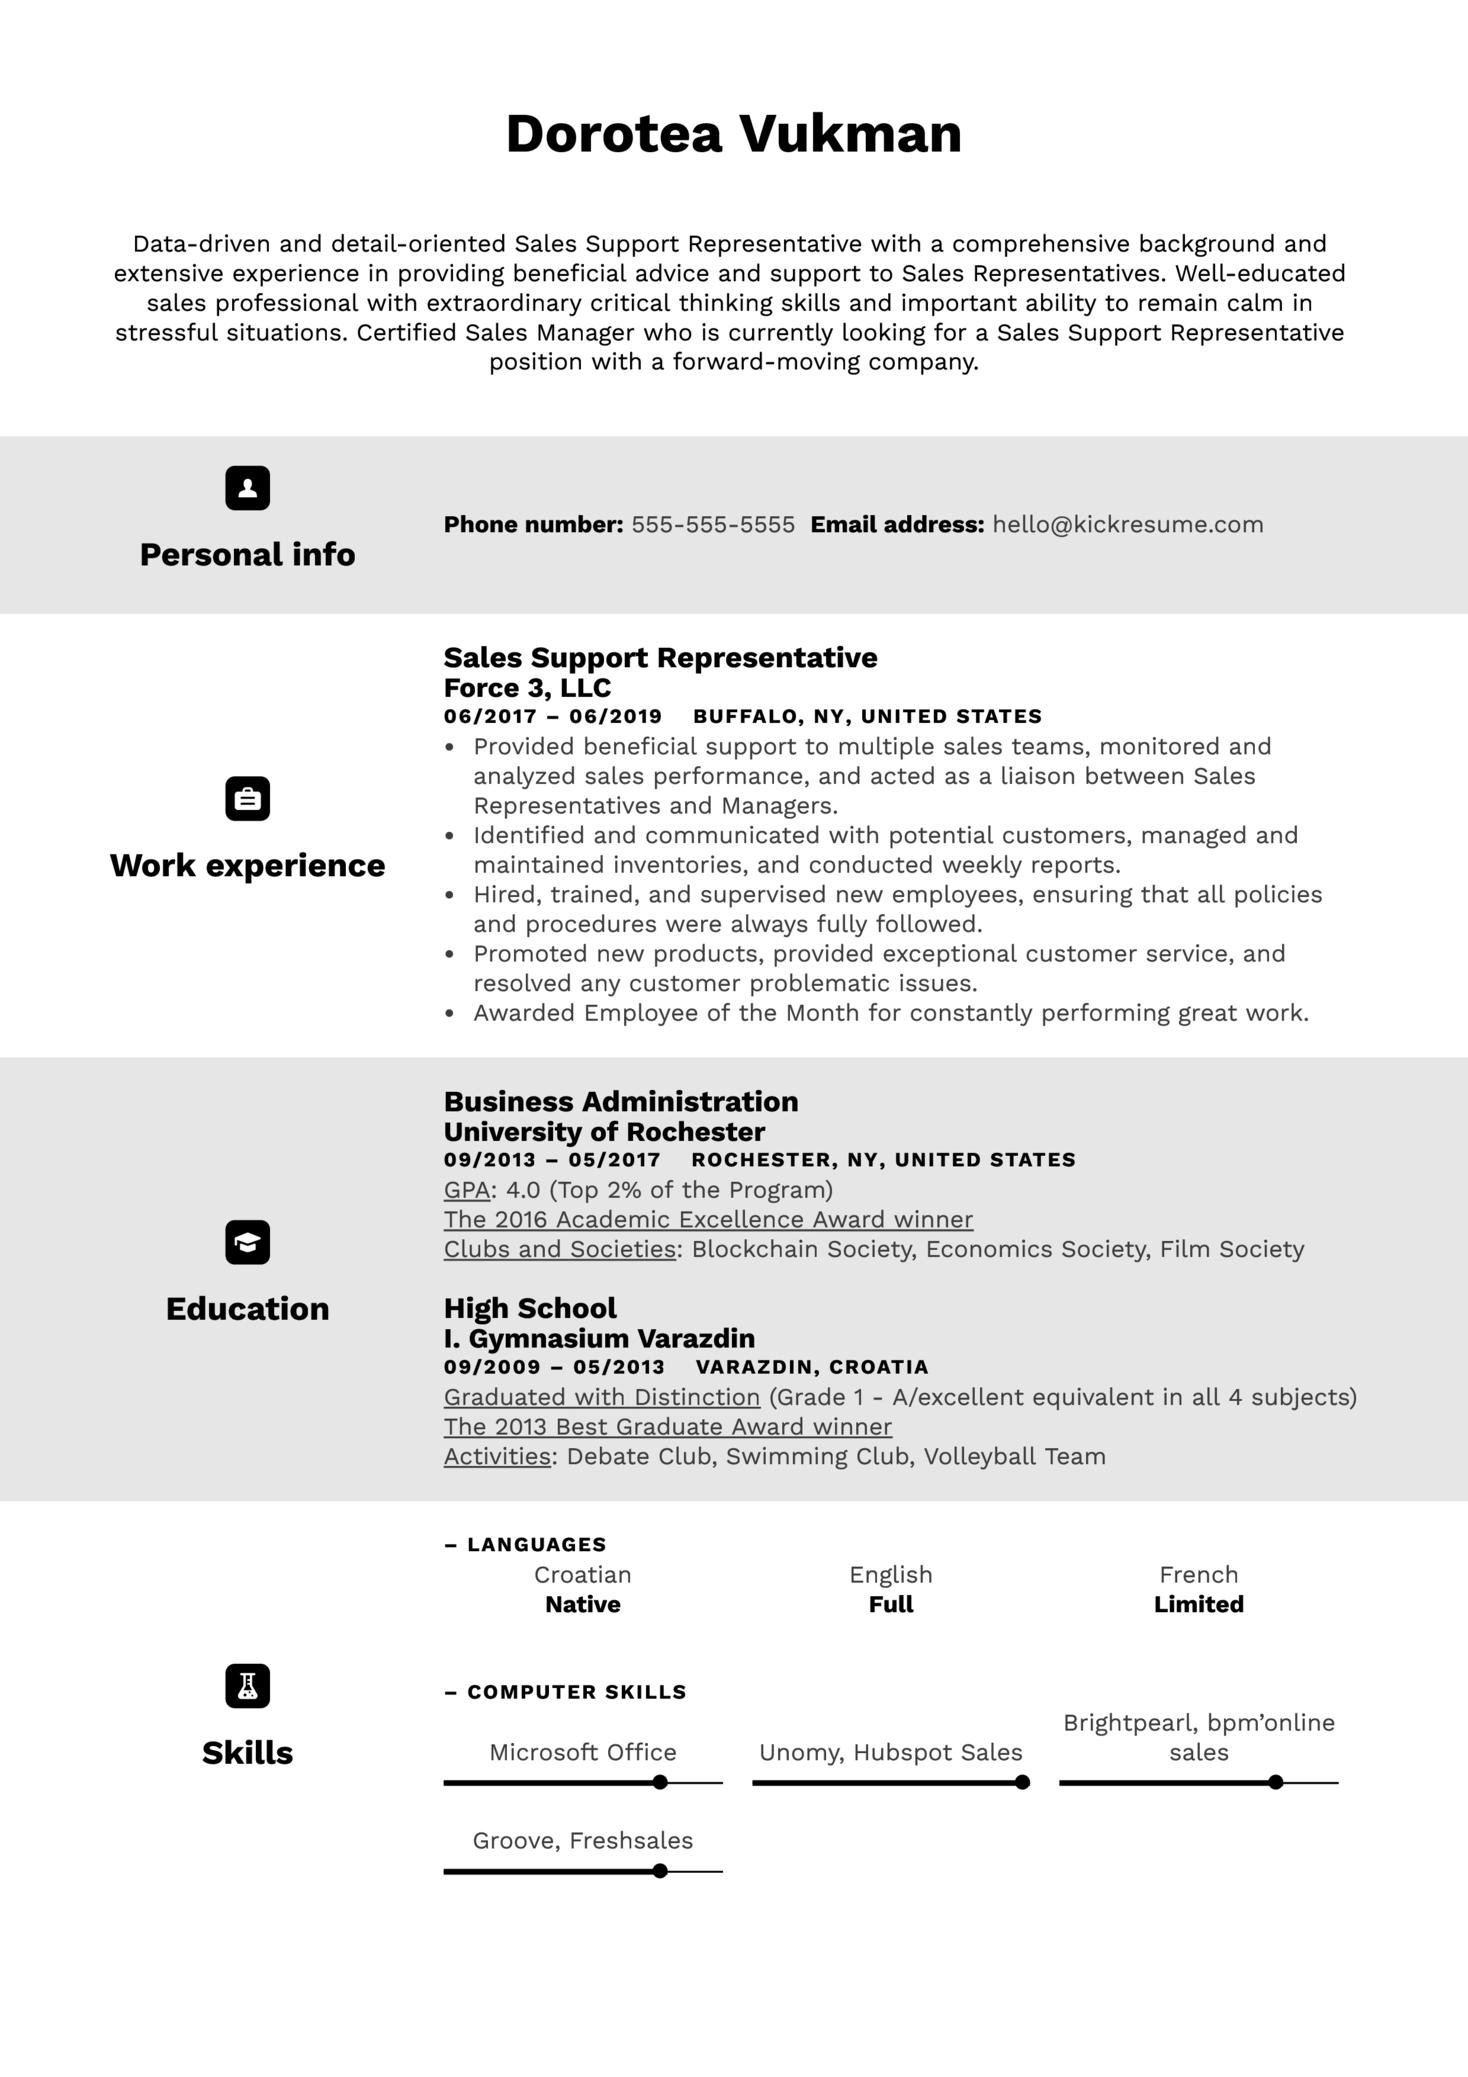 Sales Support Representative Resume Example (Part 1)